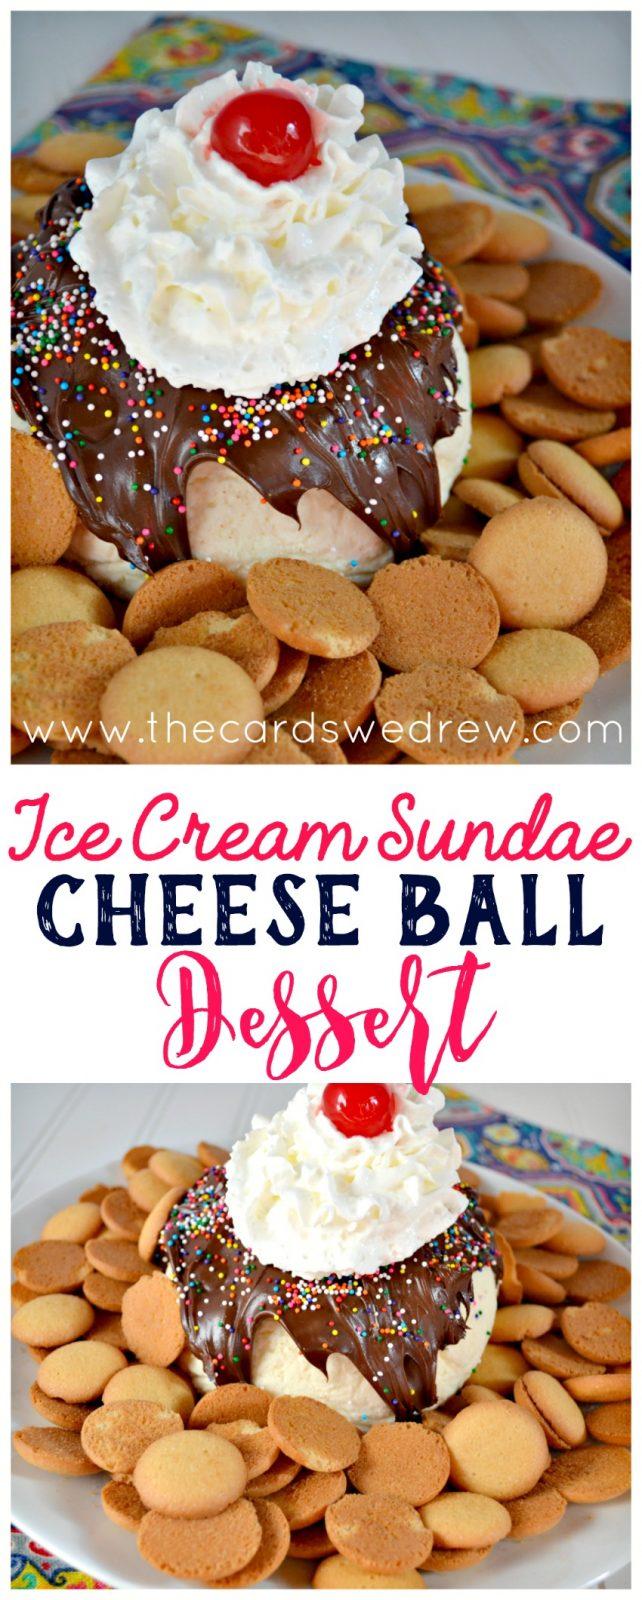 Ice Cream Sundae Cheese Ball Dessert from The Cards We Drew